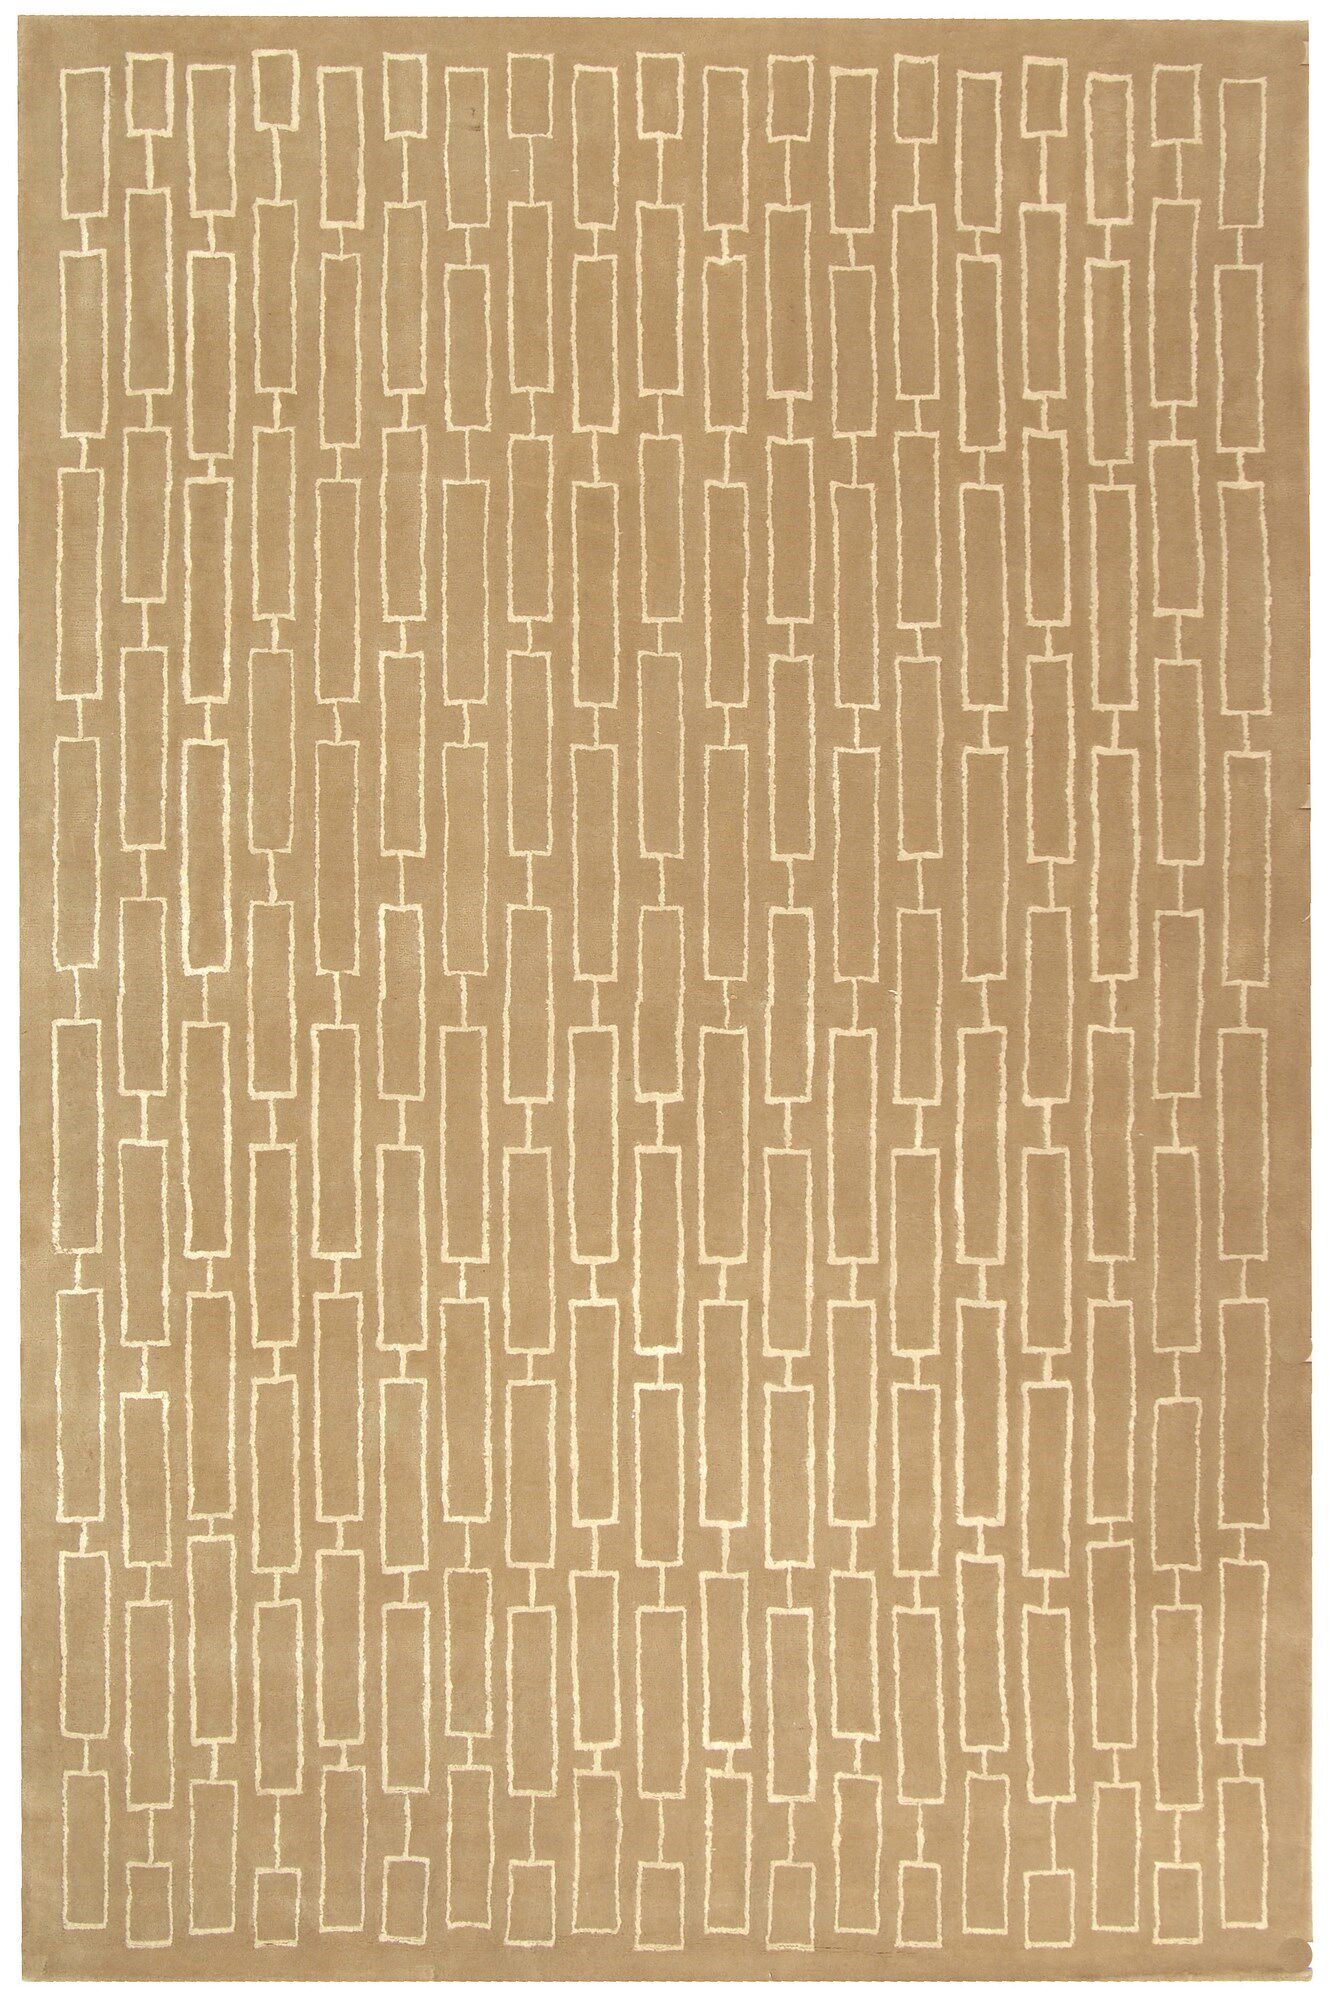 Scotchmann Hand Tufted Wool Tan Area Rug Rug Size: Rectangle 8' x 10'